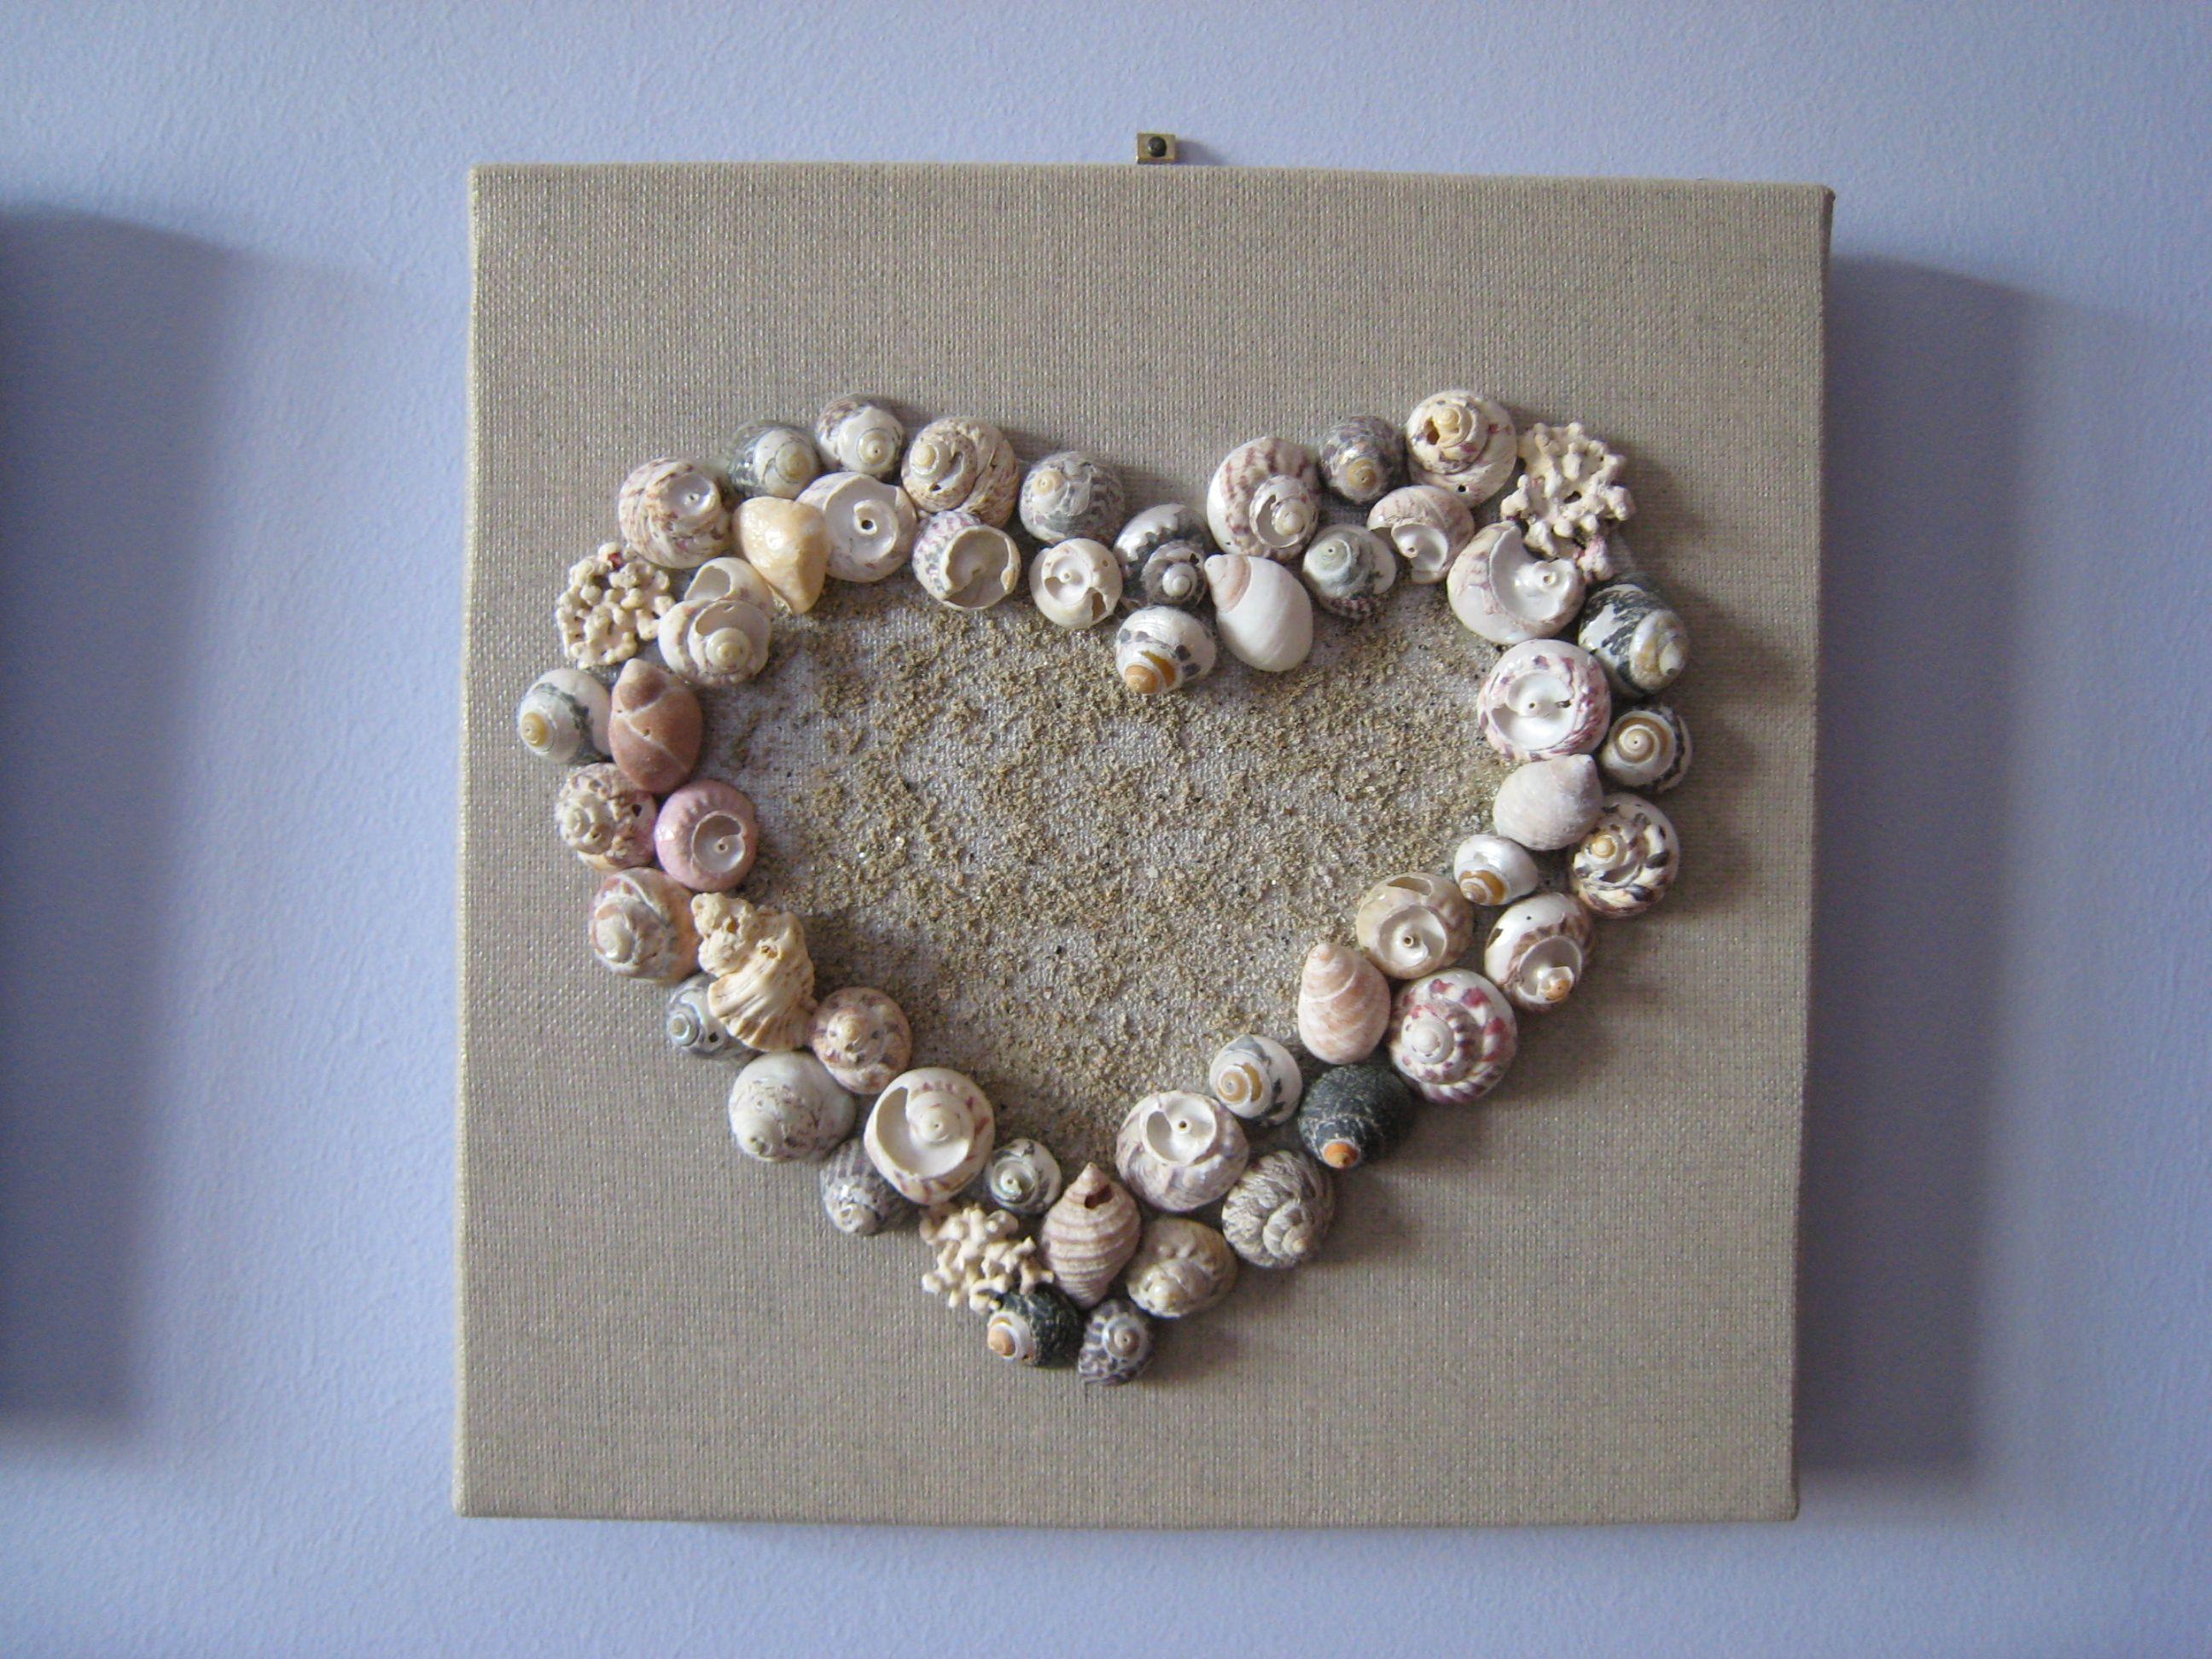 Image result for bricolage avec coquillage crafts - Bricolage avec coquillage ...